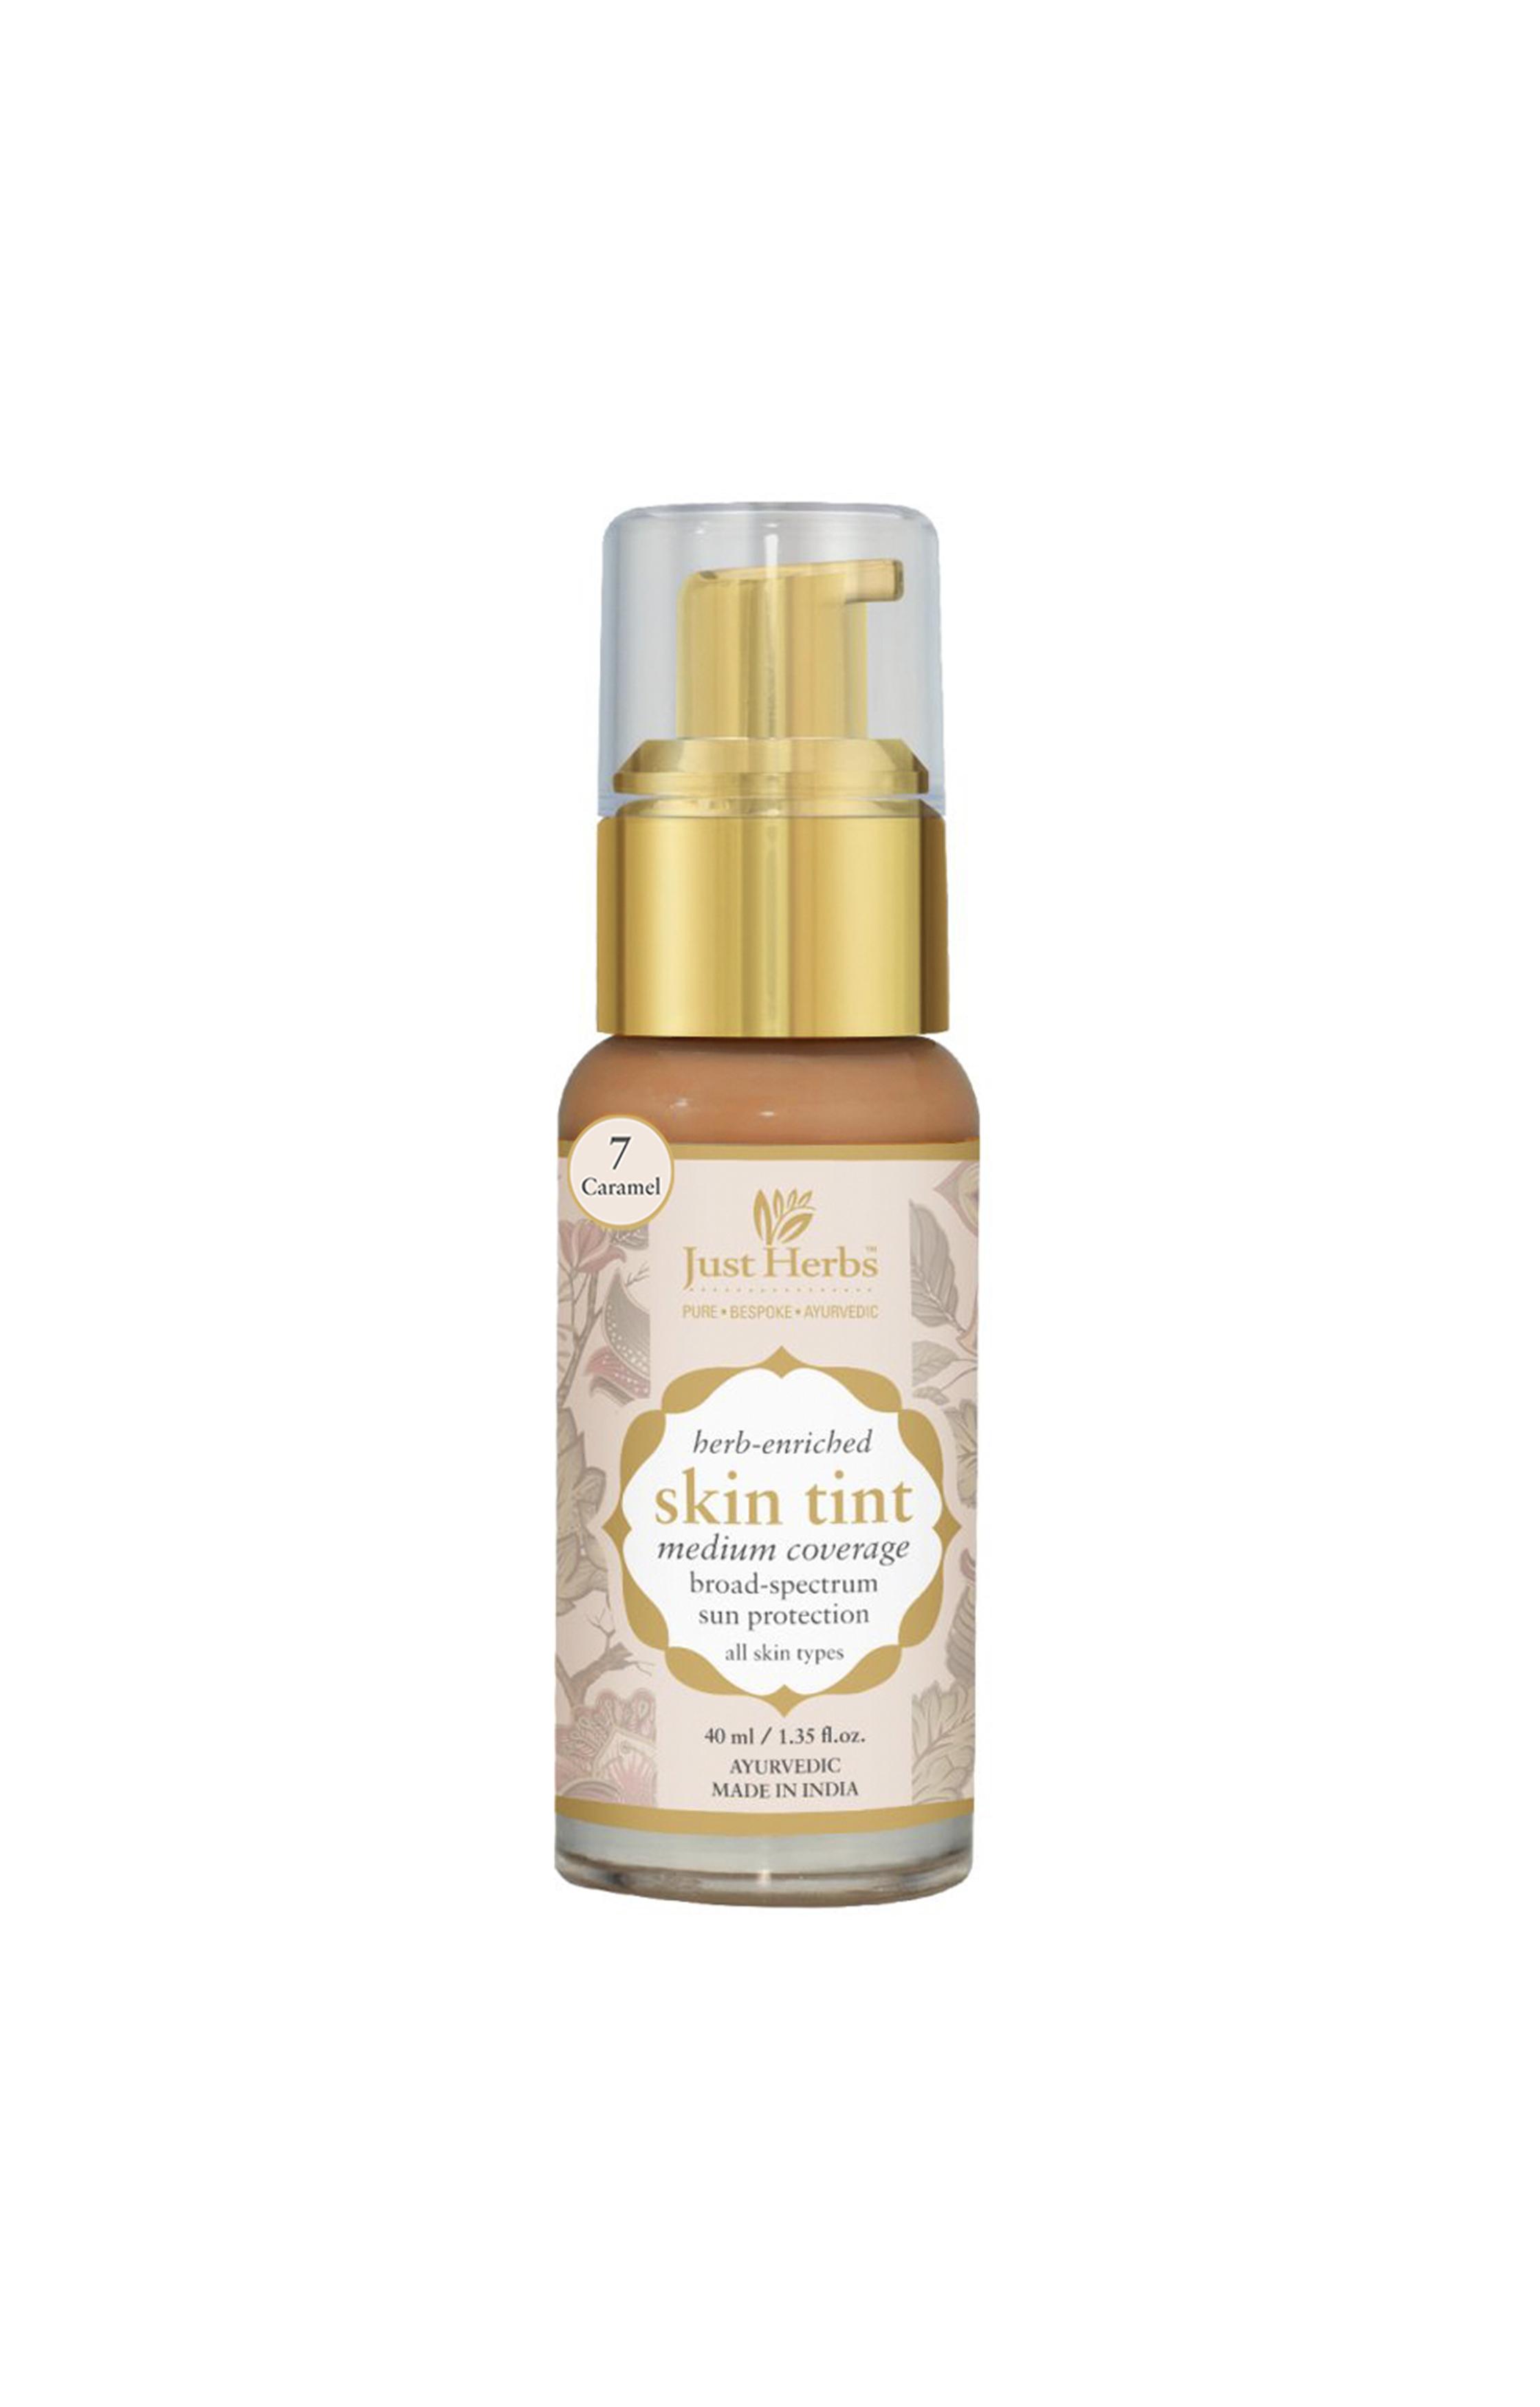 Just Herbs | Just Herbs skin tint - 7 Caramel